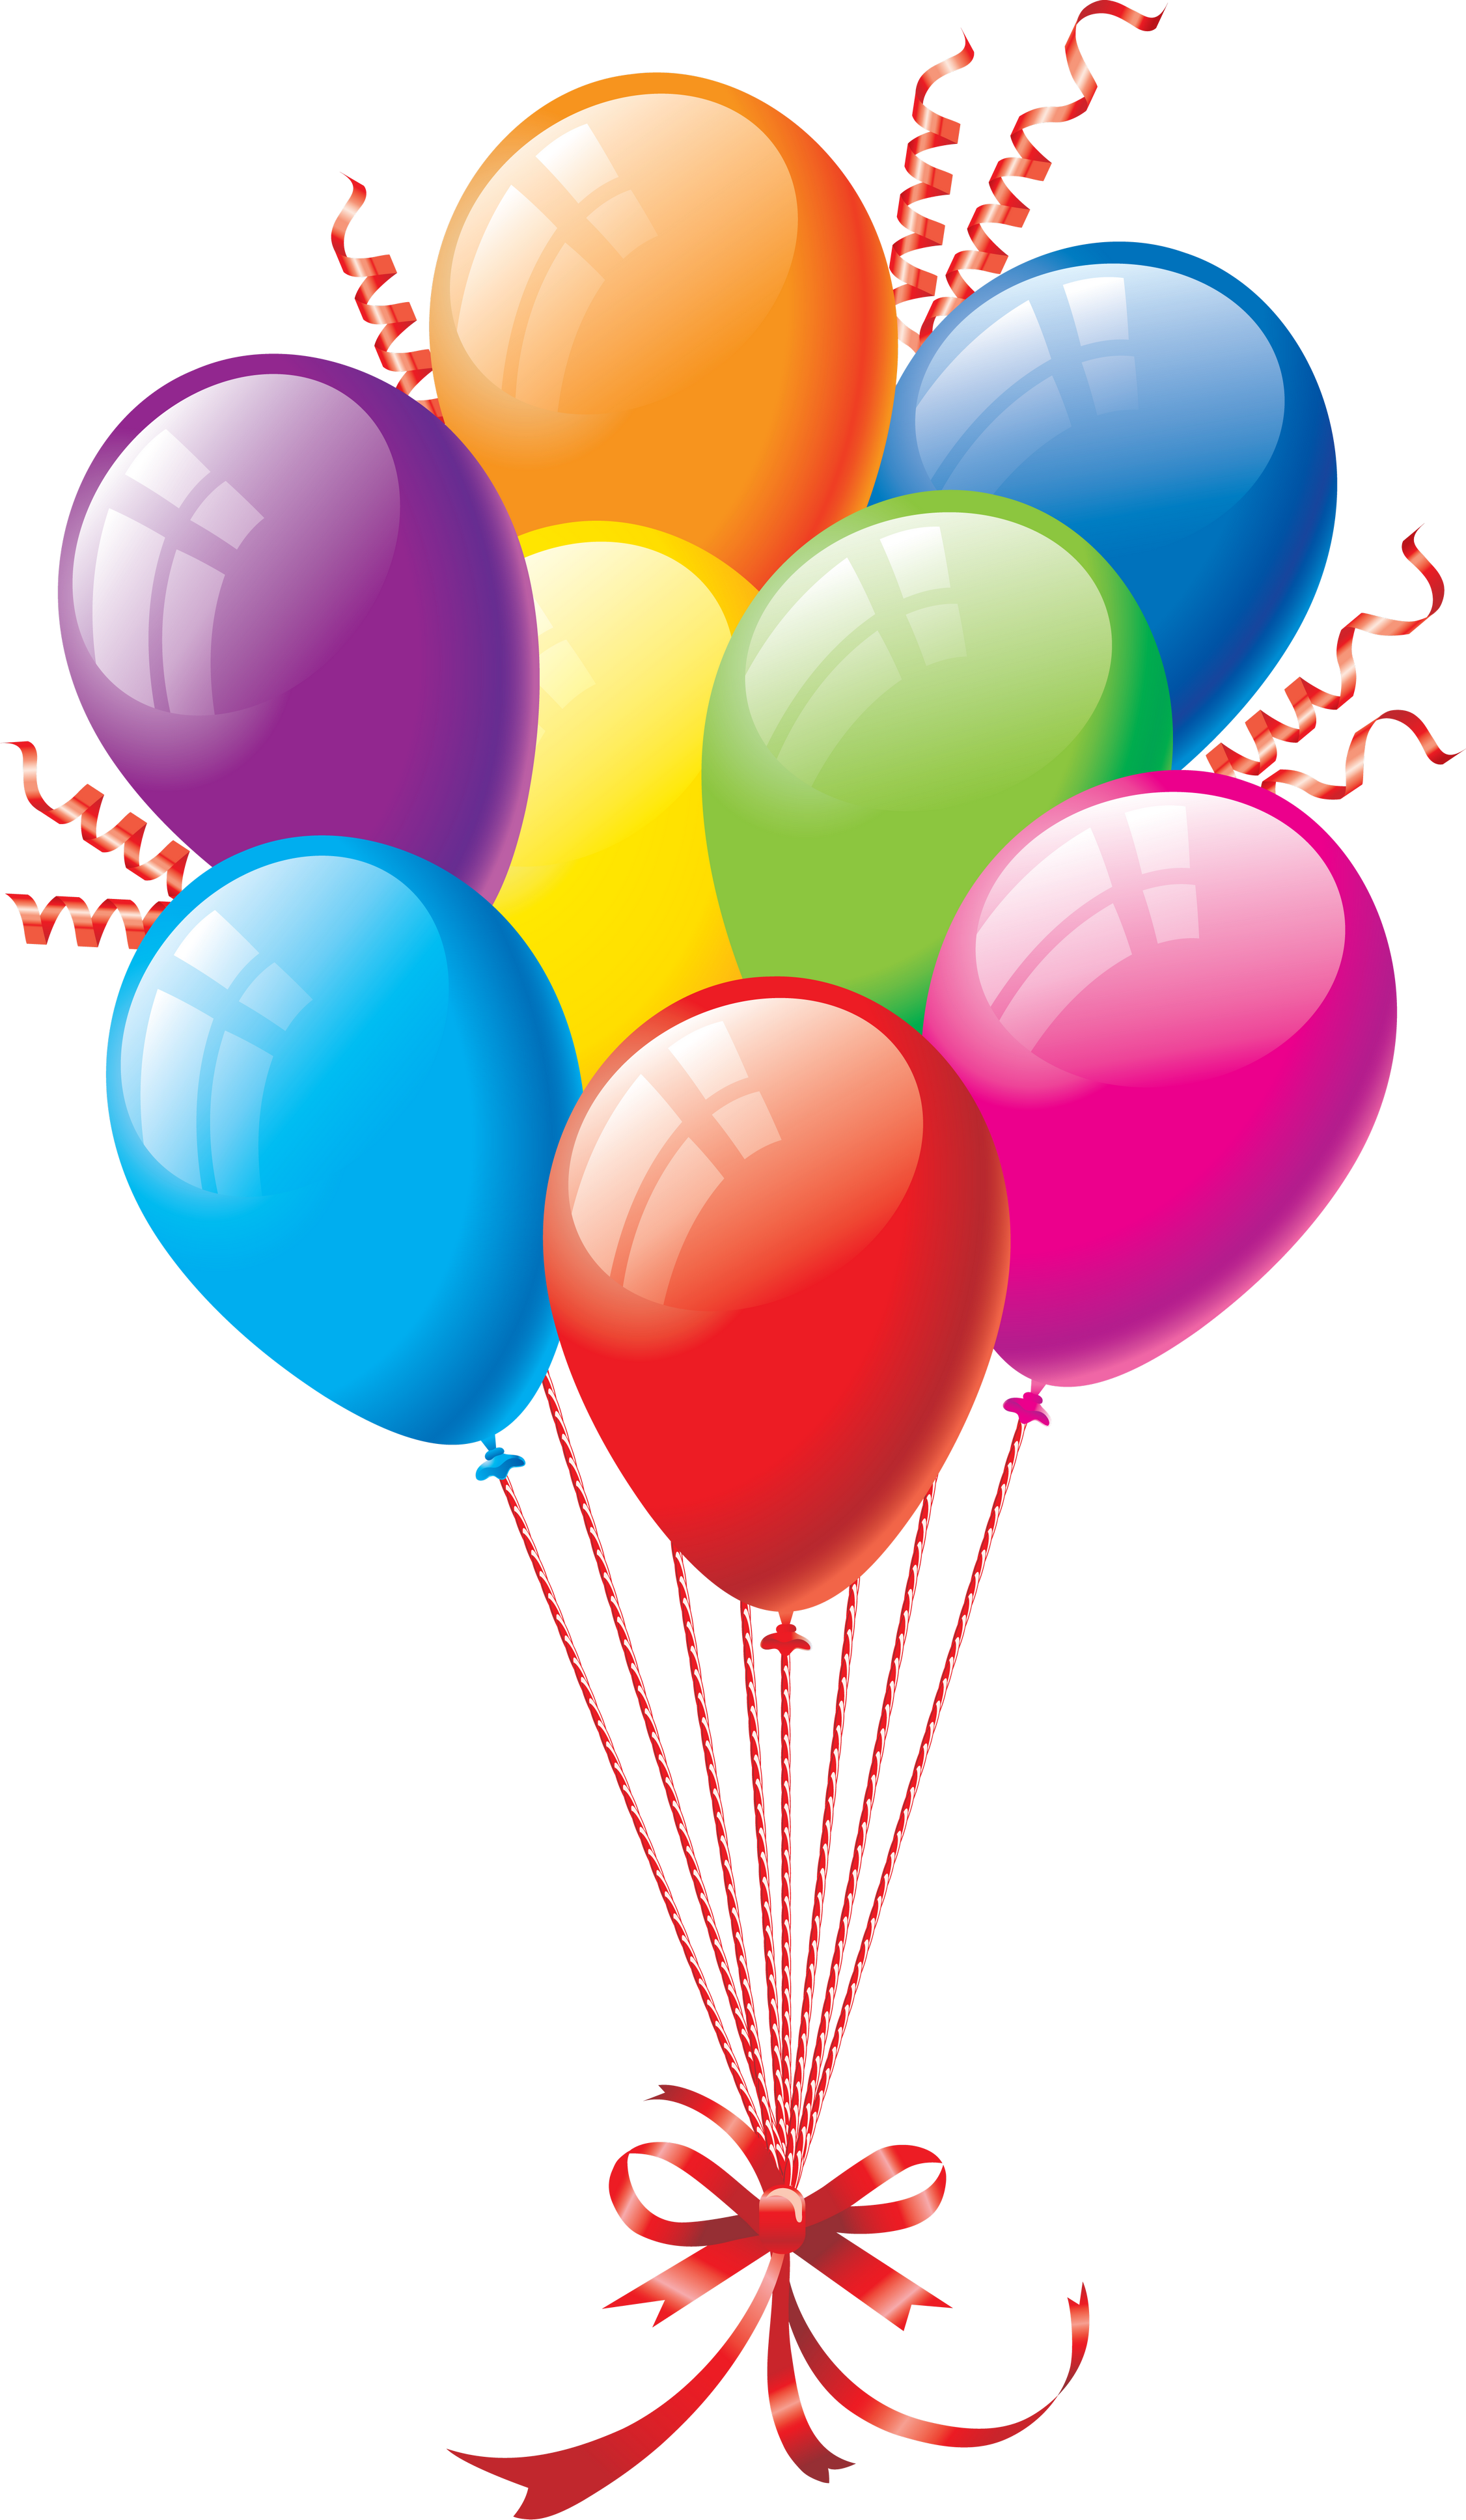 Bubbly cross clipart clipart download 0_76f6a_ac47a0a7_orig.png (2252×3871) | ❅ Clipart ❅ (Клипарт ... clipart download